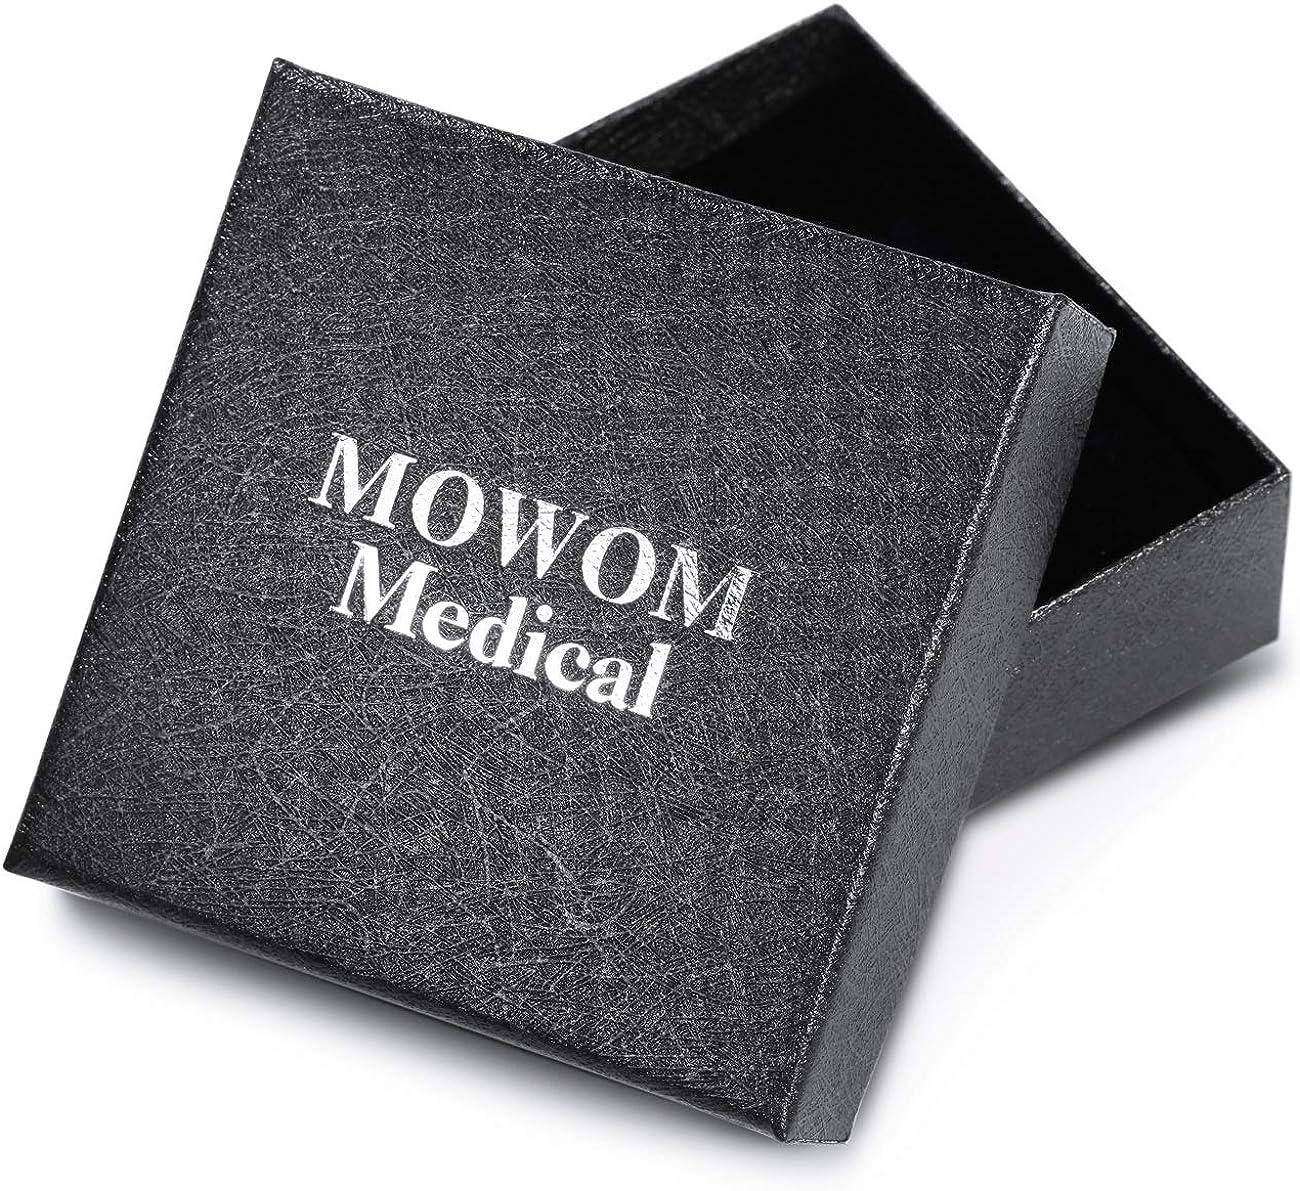 MOWOM Medical SOS Notfall Armband Personalisiertes Gravur Silikon Edelstahl Namensarmband M/änner Damen Jungen M/ädchen B/ündel mit Notfallkarte Kartenh/ülle